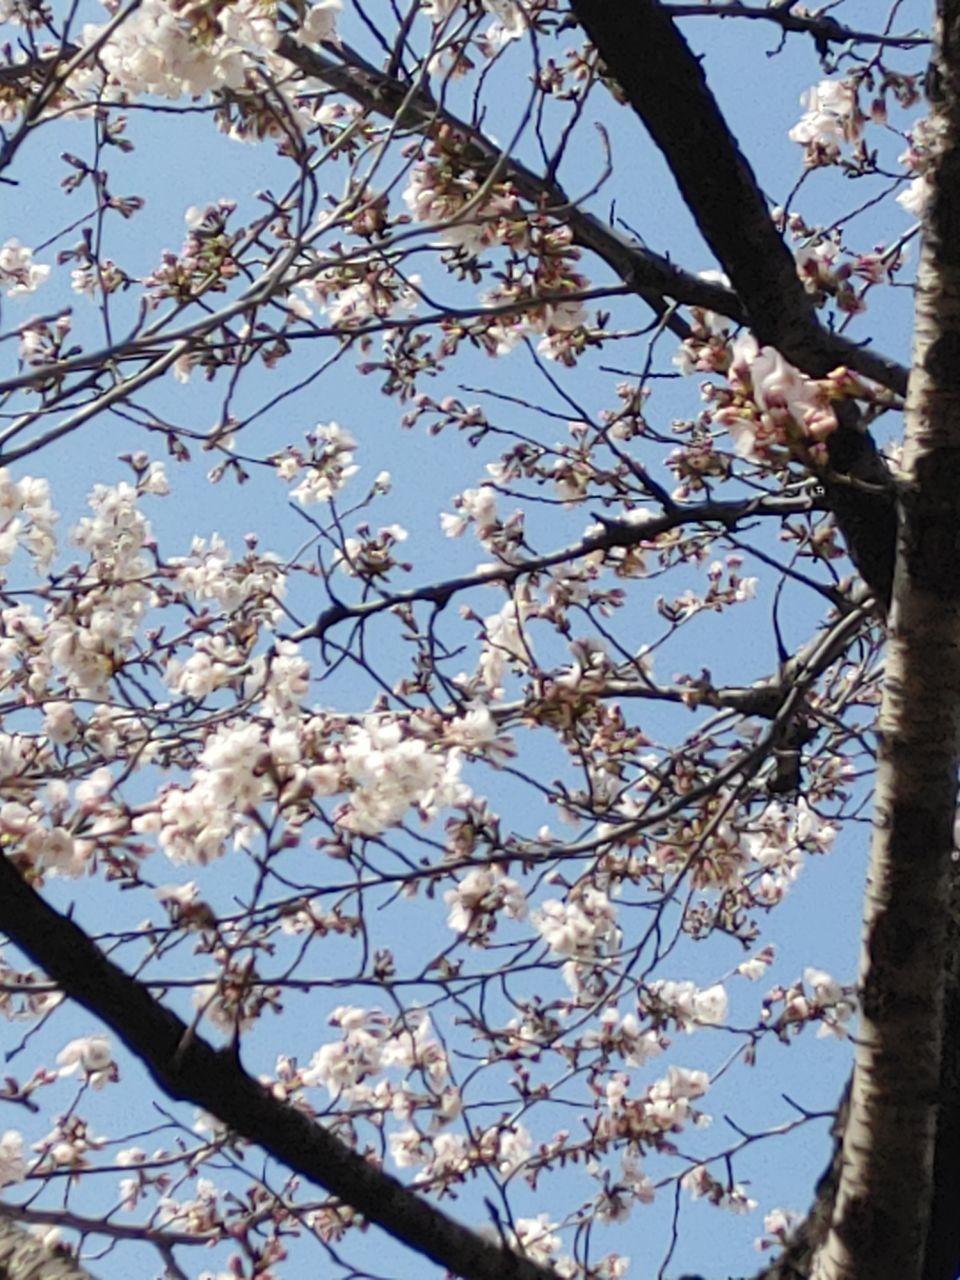 photo_2020-03-27_21-45-19.jpg